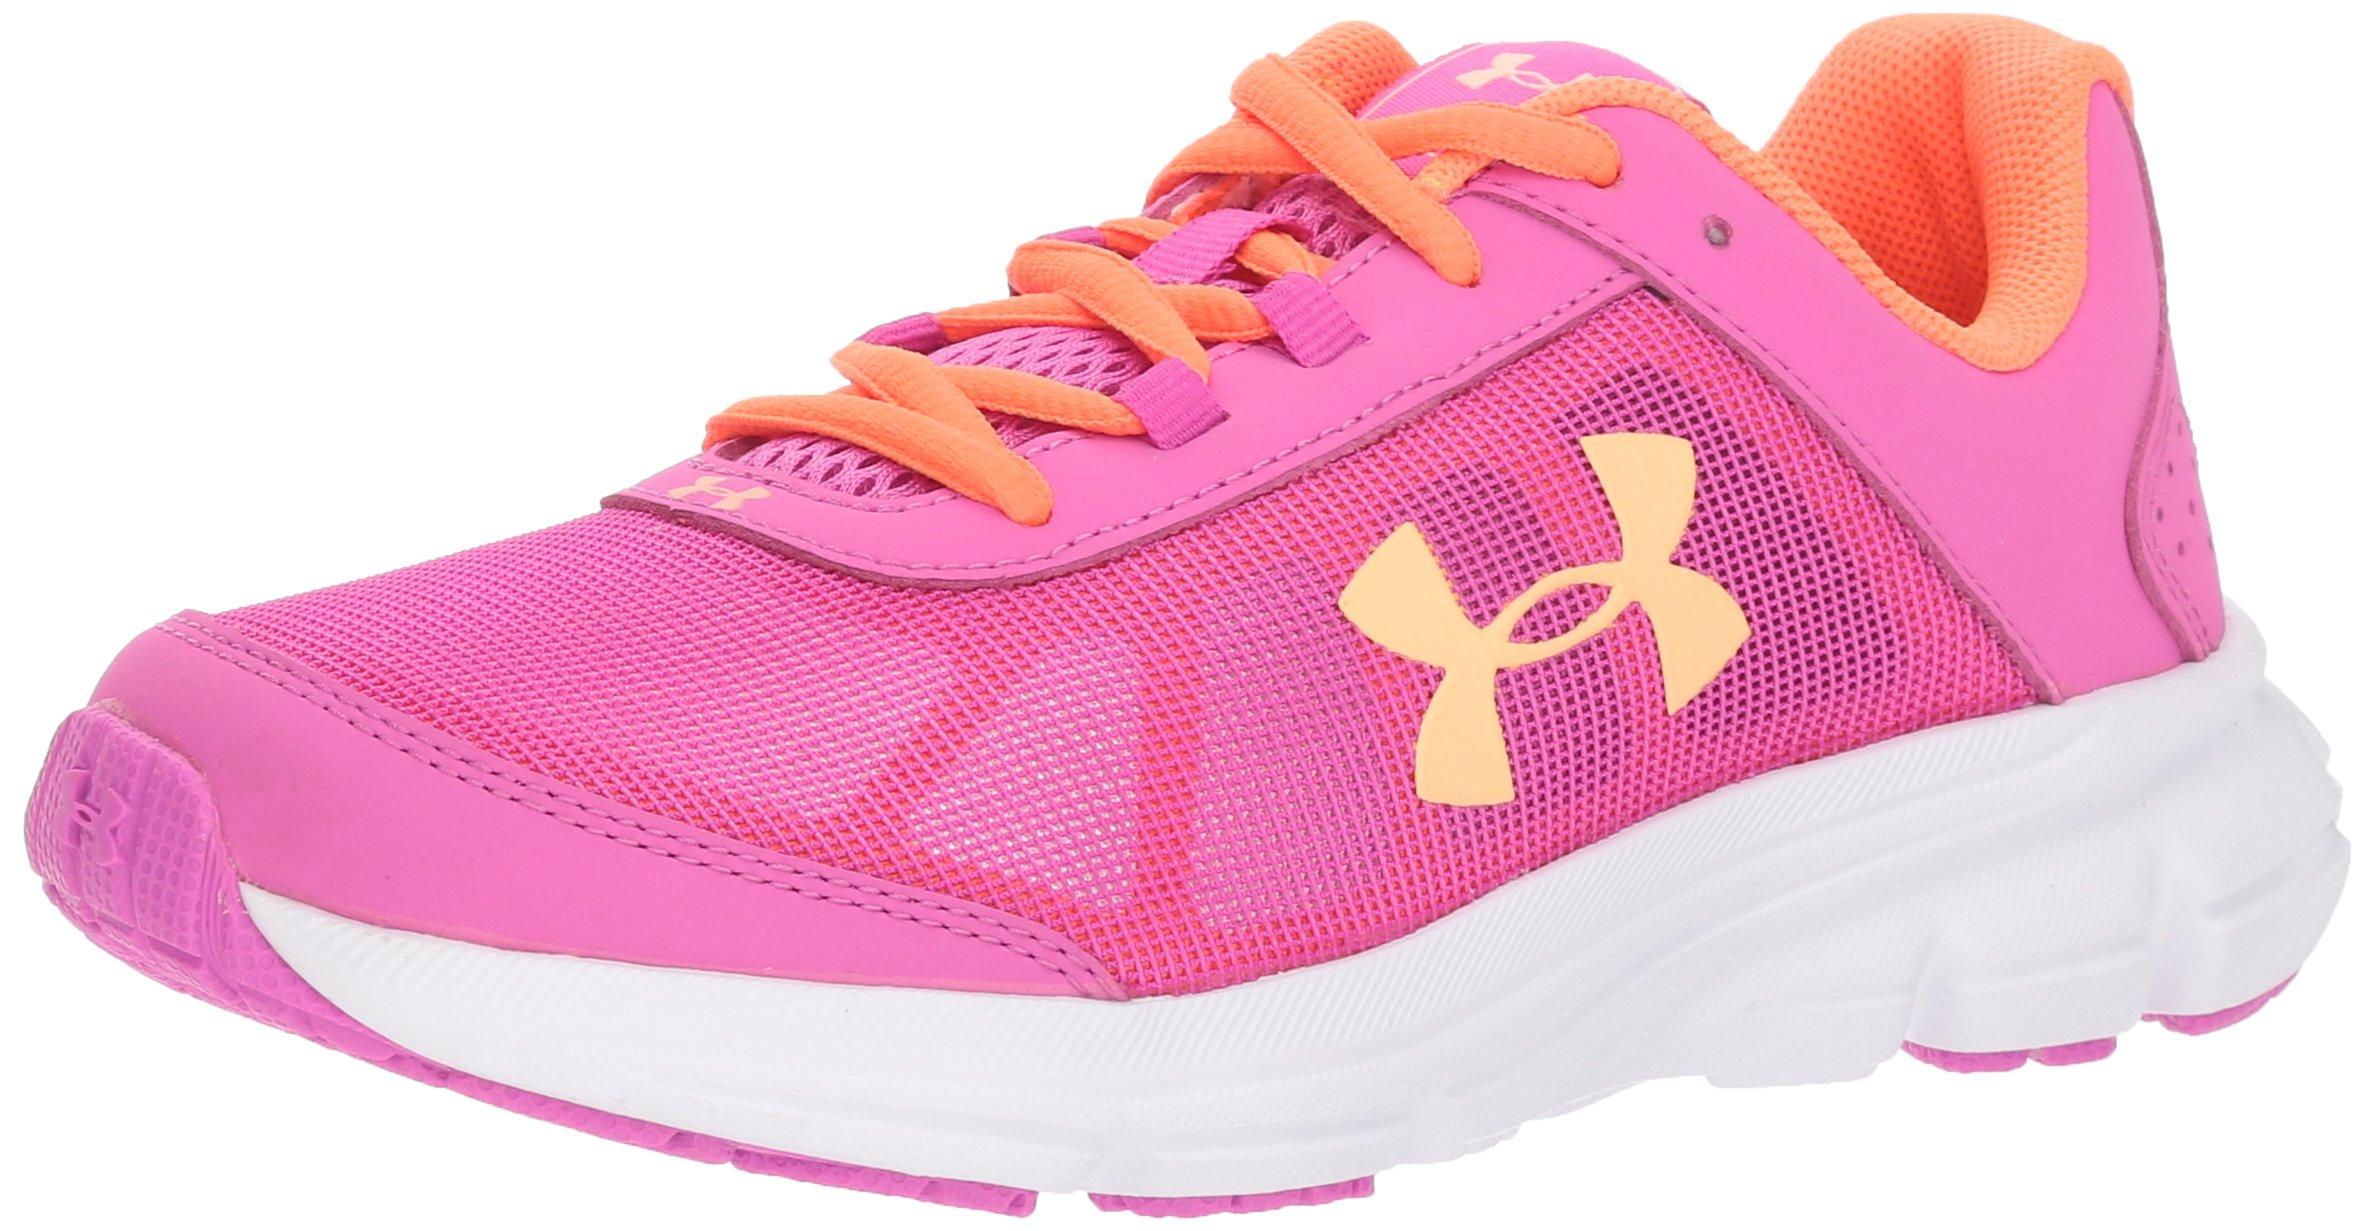 Under Armour Girls' Grade School Rave 2 Sneaker, 502/Fluo Fuchsia, 4